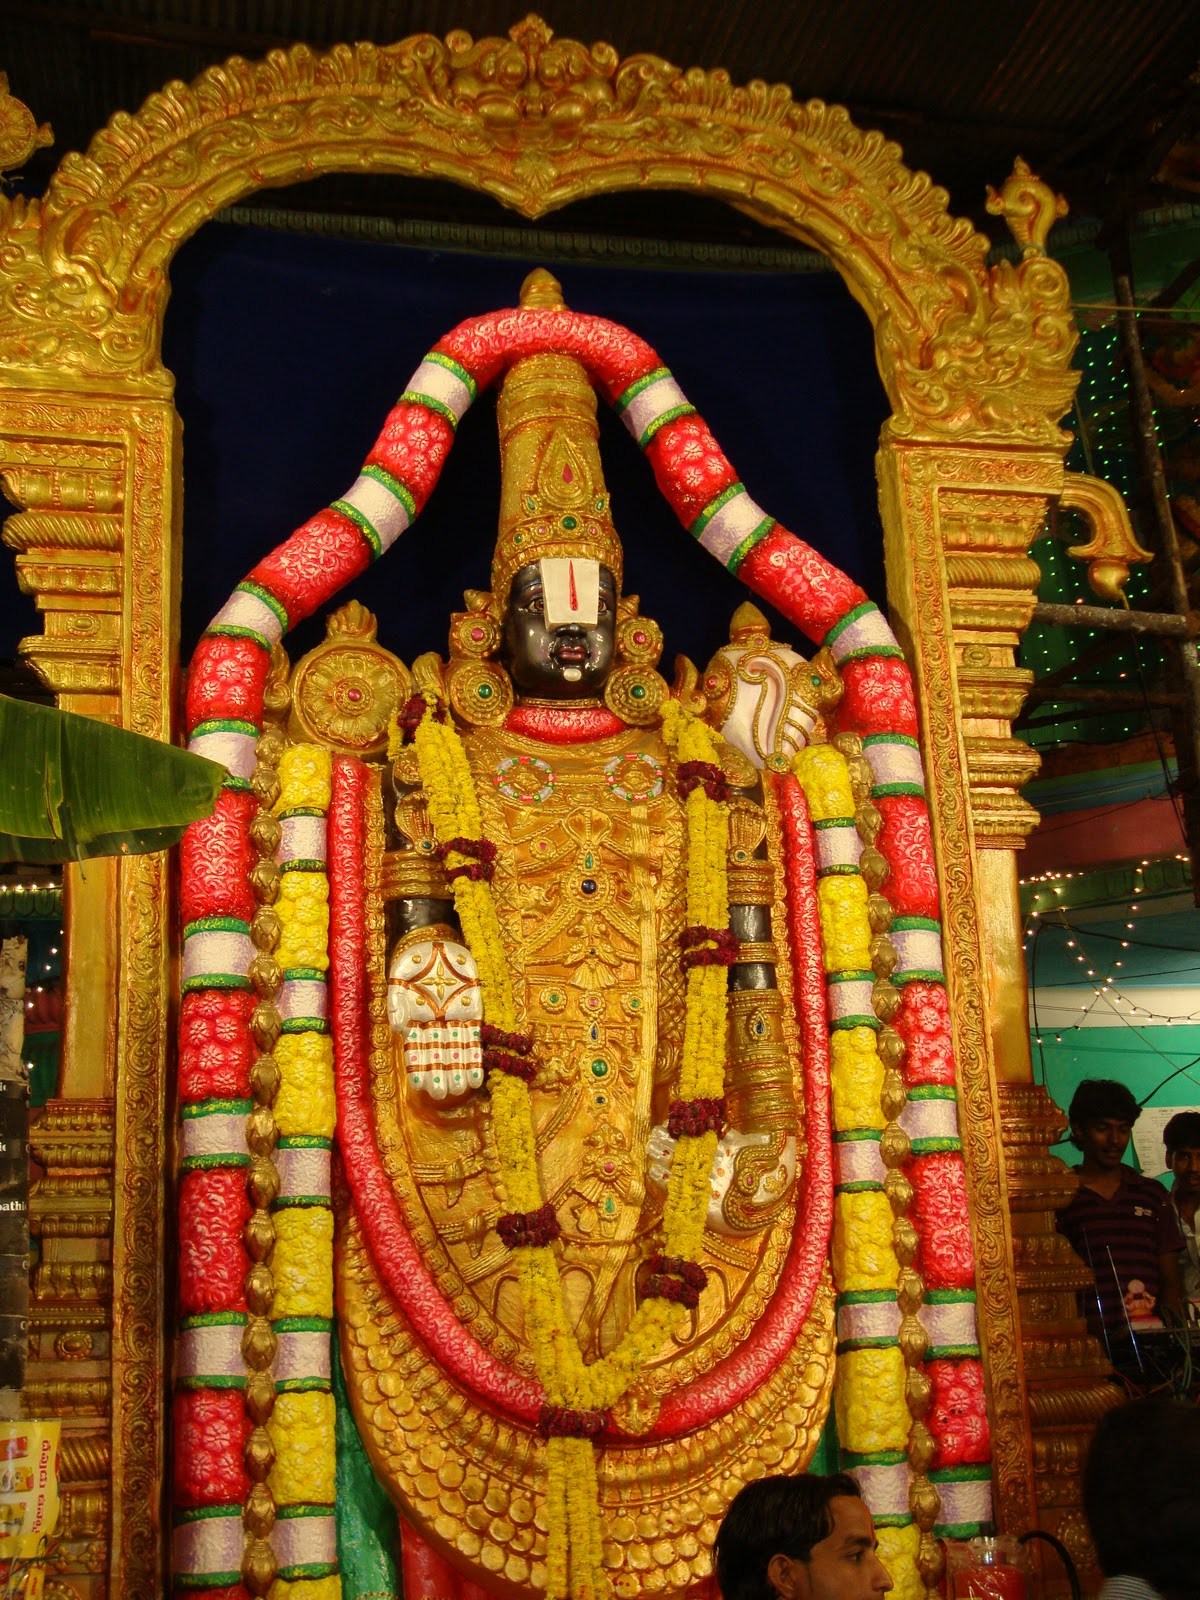 Madhavi 3d Name Wallpapers Hd Wallpapers Hdwallpapers Org In Lord Venkateswara